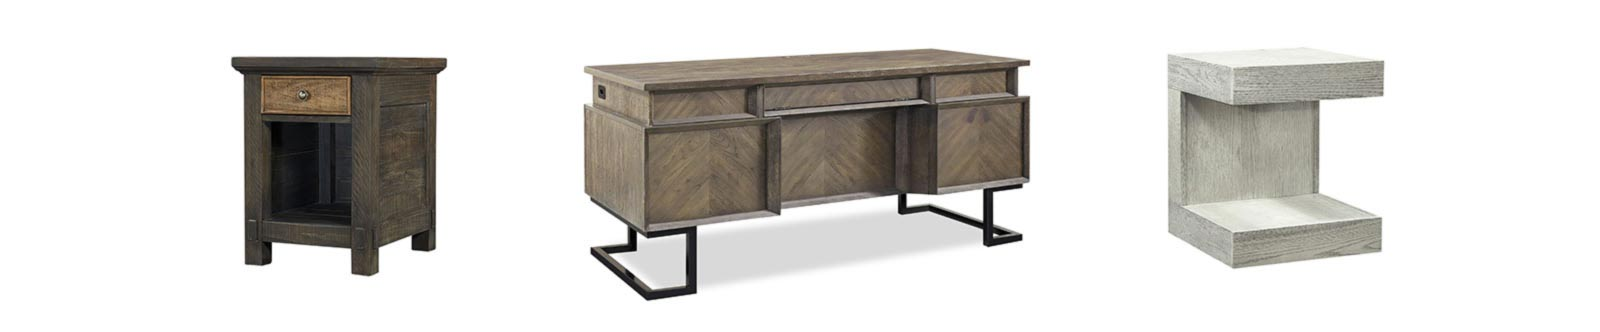 aspenhome furniture supplier